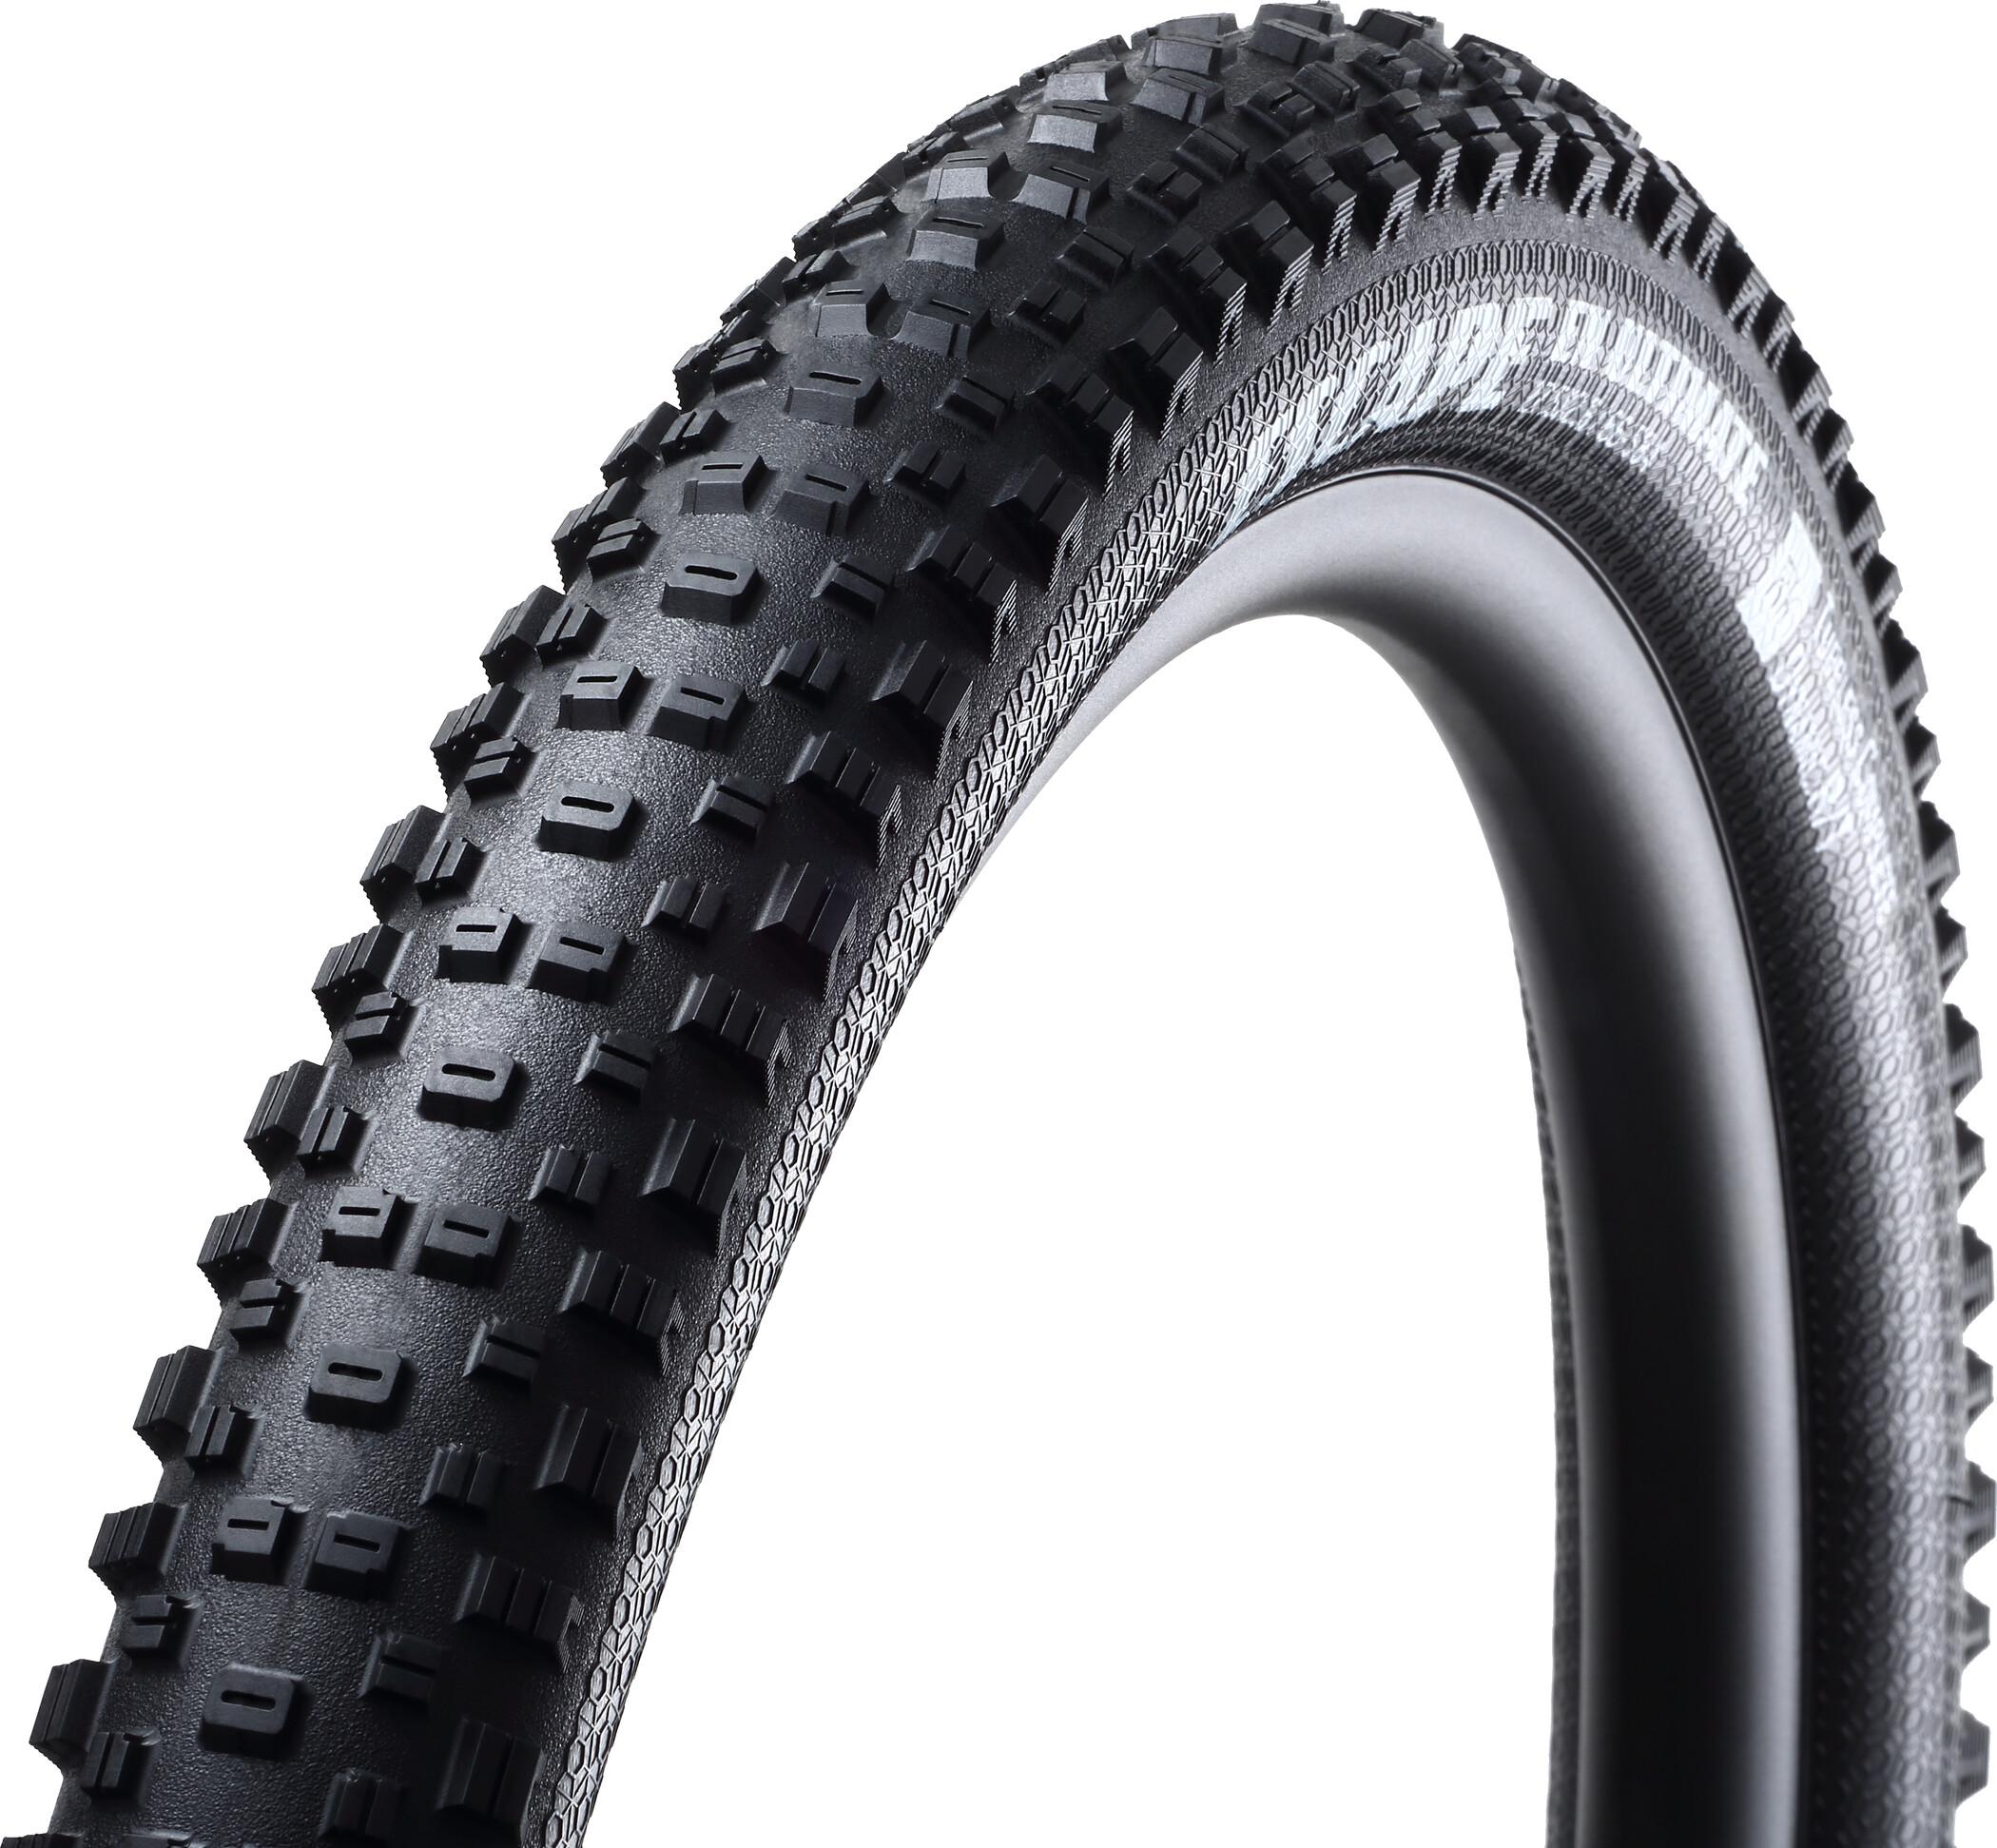 Goodyear Escape EN Ultimate Foldedæk 66-622 Tubeless Complete Dynamic R/T e25, black (2019)   Tyres